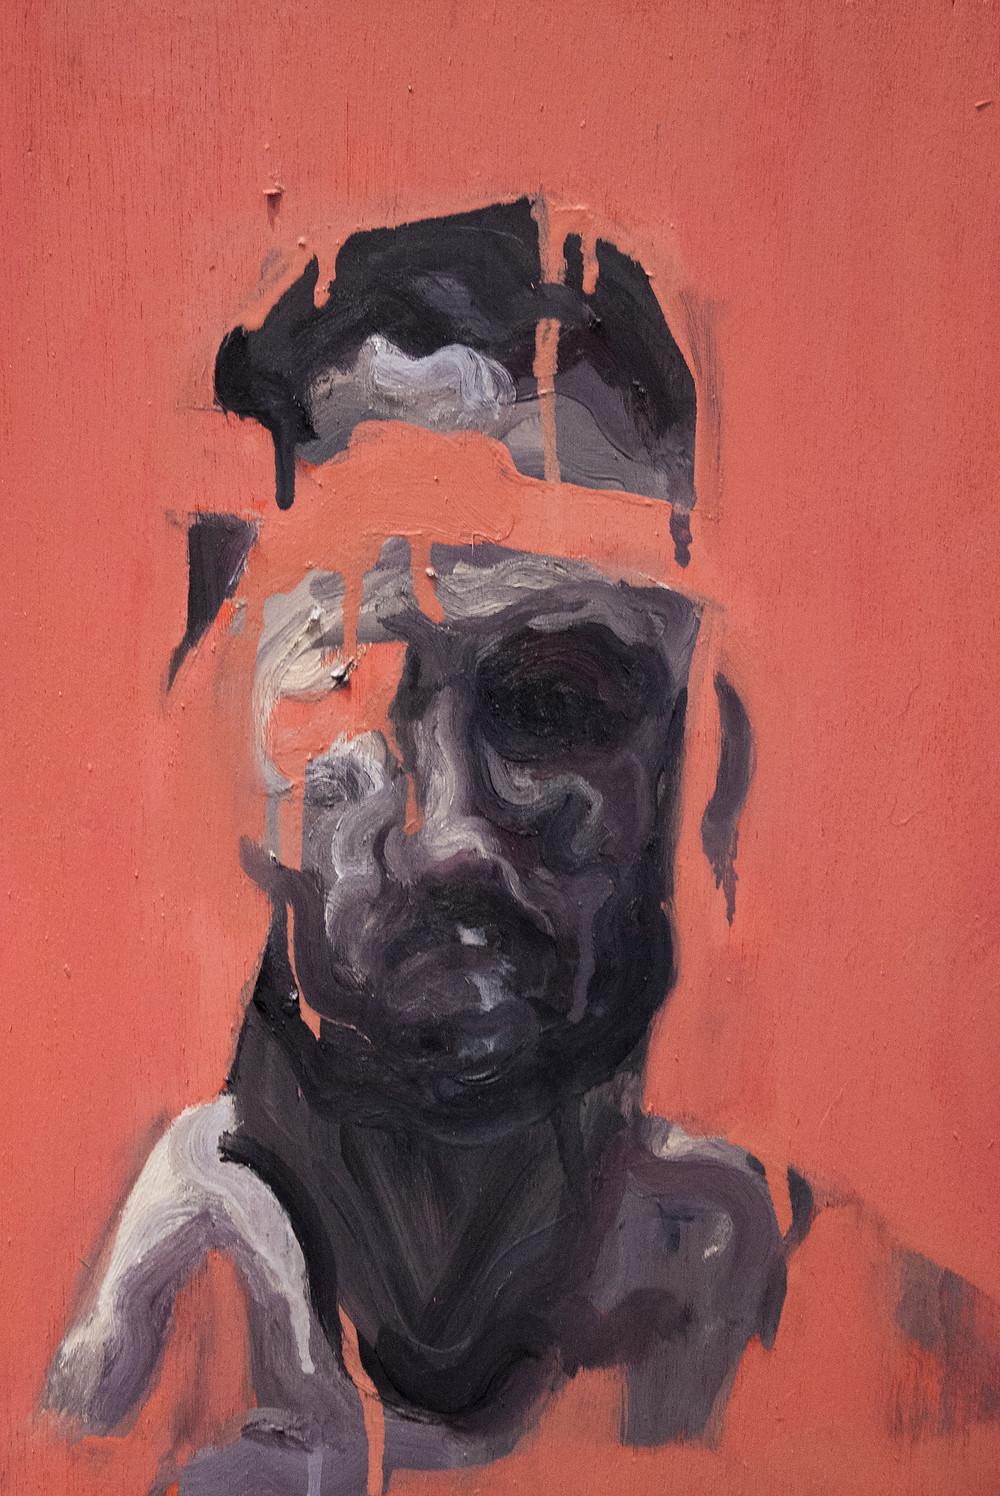 Funnel (Self Portrait) / Oil on Wood / 20 x 30 cm